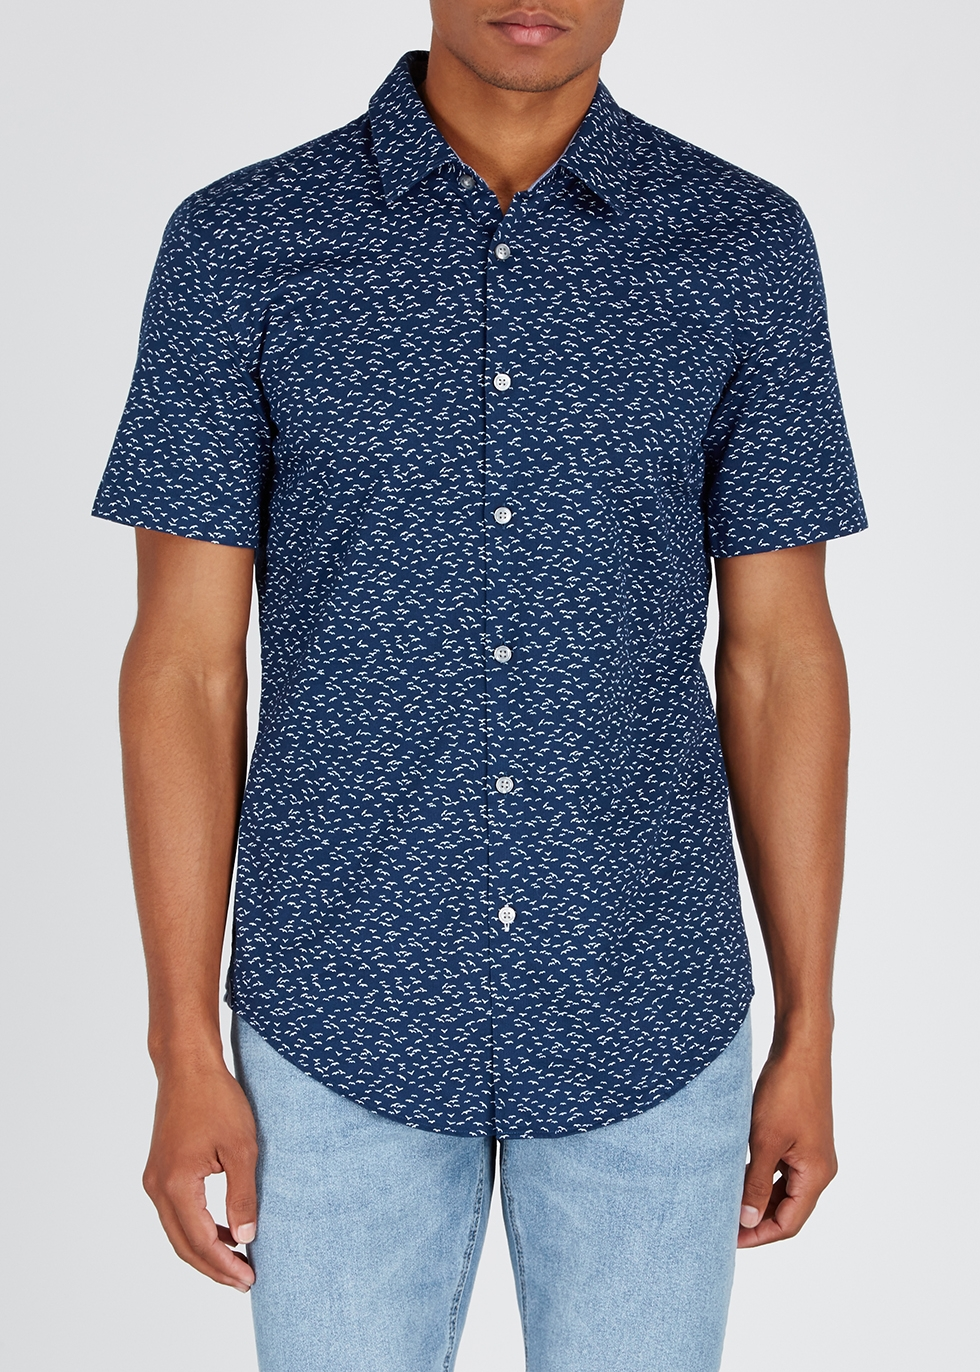 Ronn printed cotton piqué shirt - HUGO